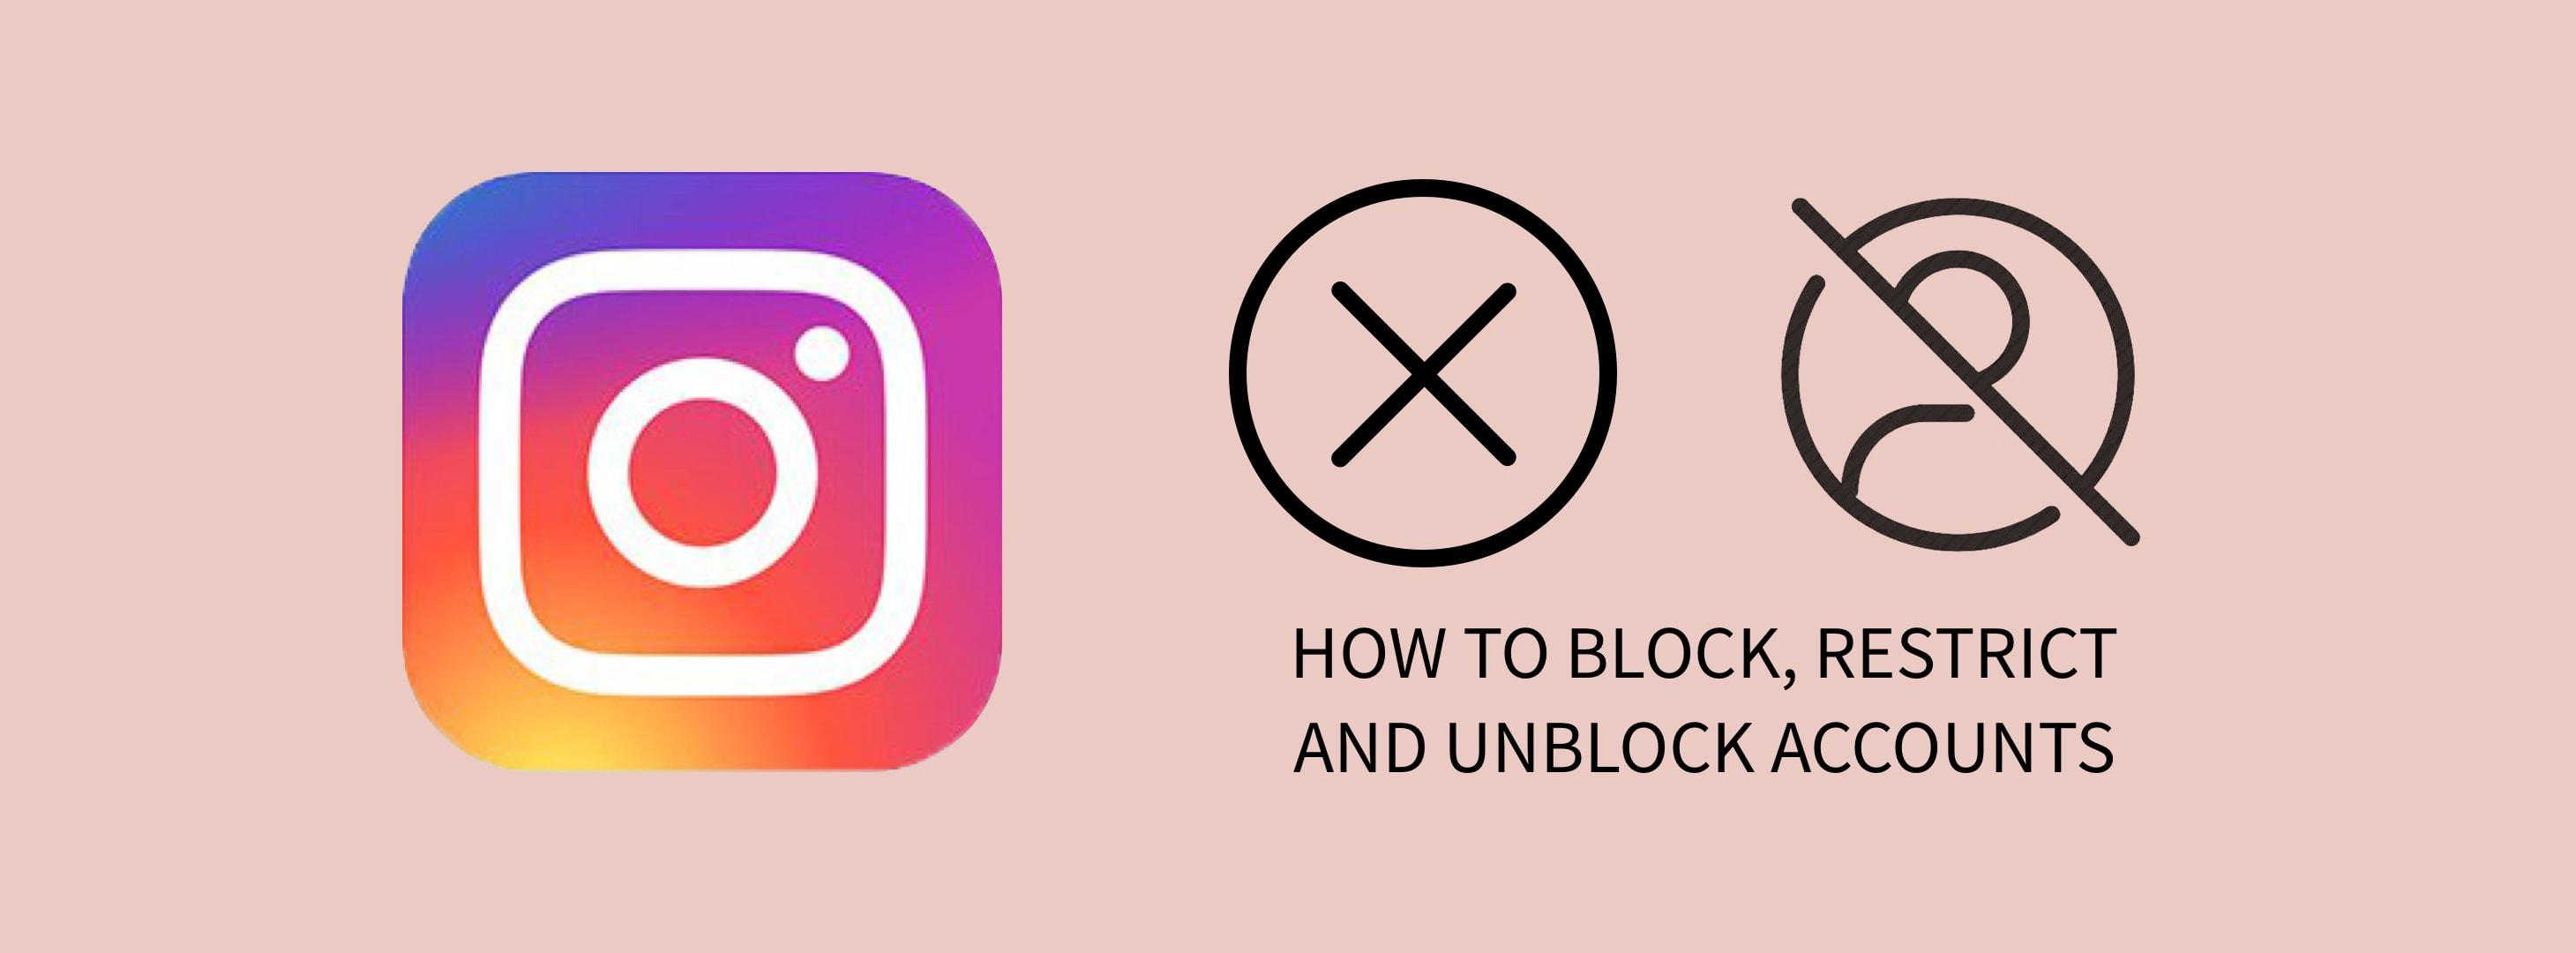 allapplenews-block-restrict-unblock-instagram-account